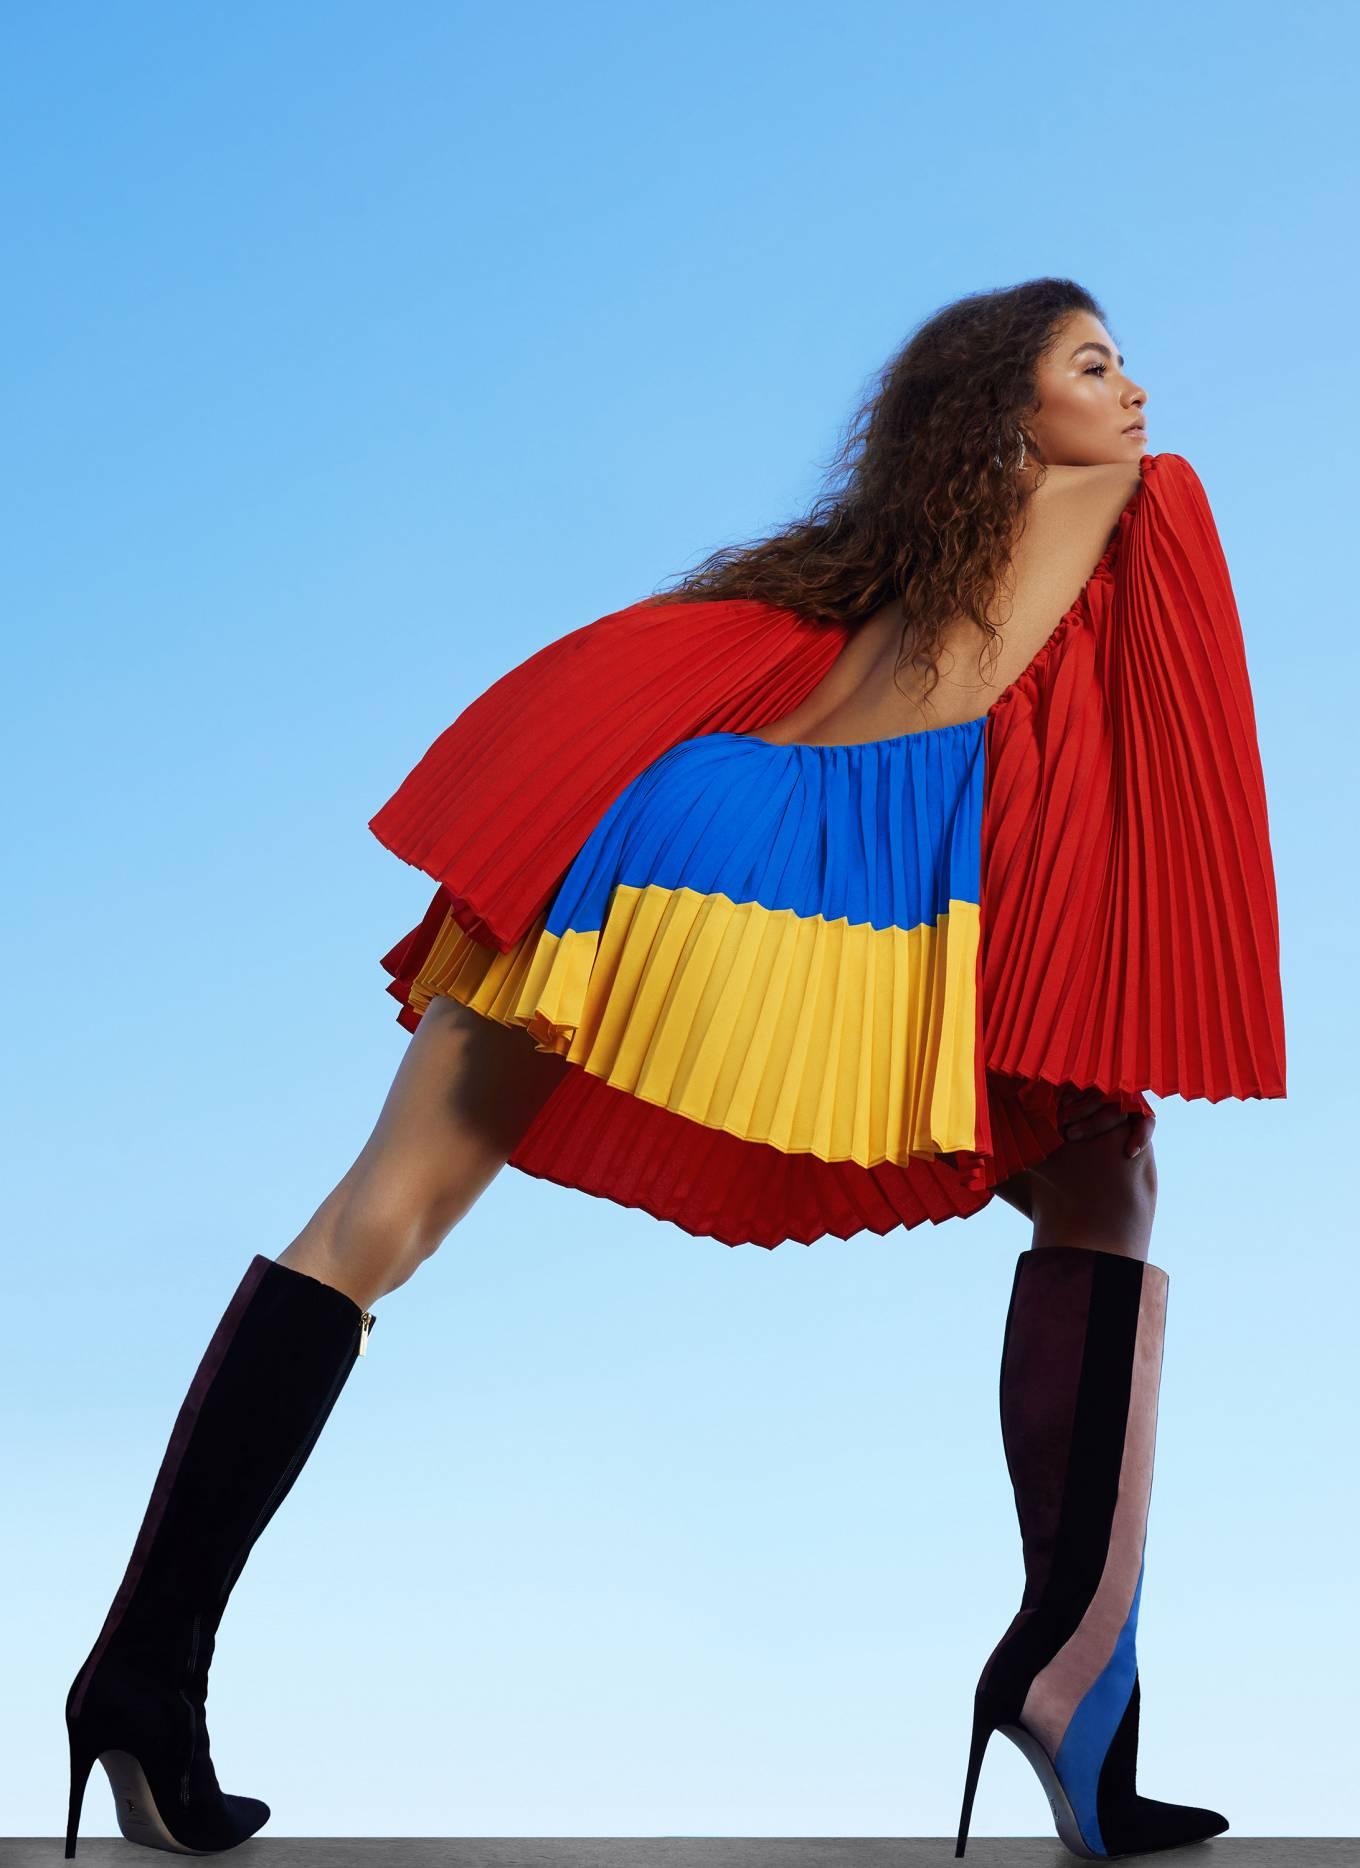 Zendaya Coleman 2020 : Zendaya Coleman – InStyle Magazine (September 2020)-10